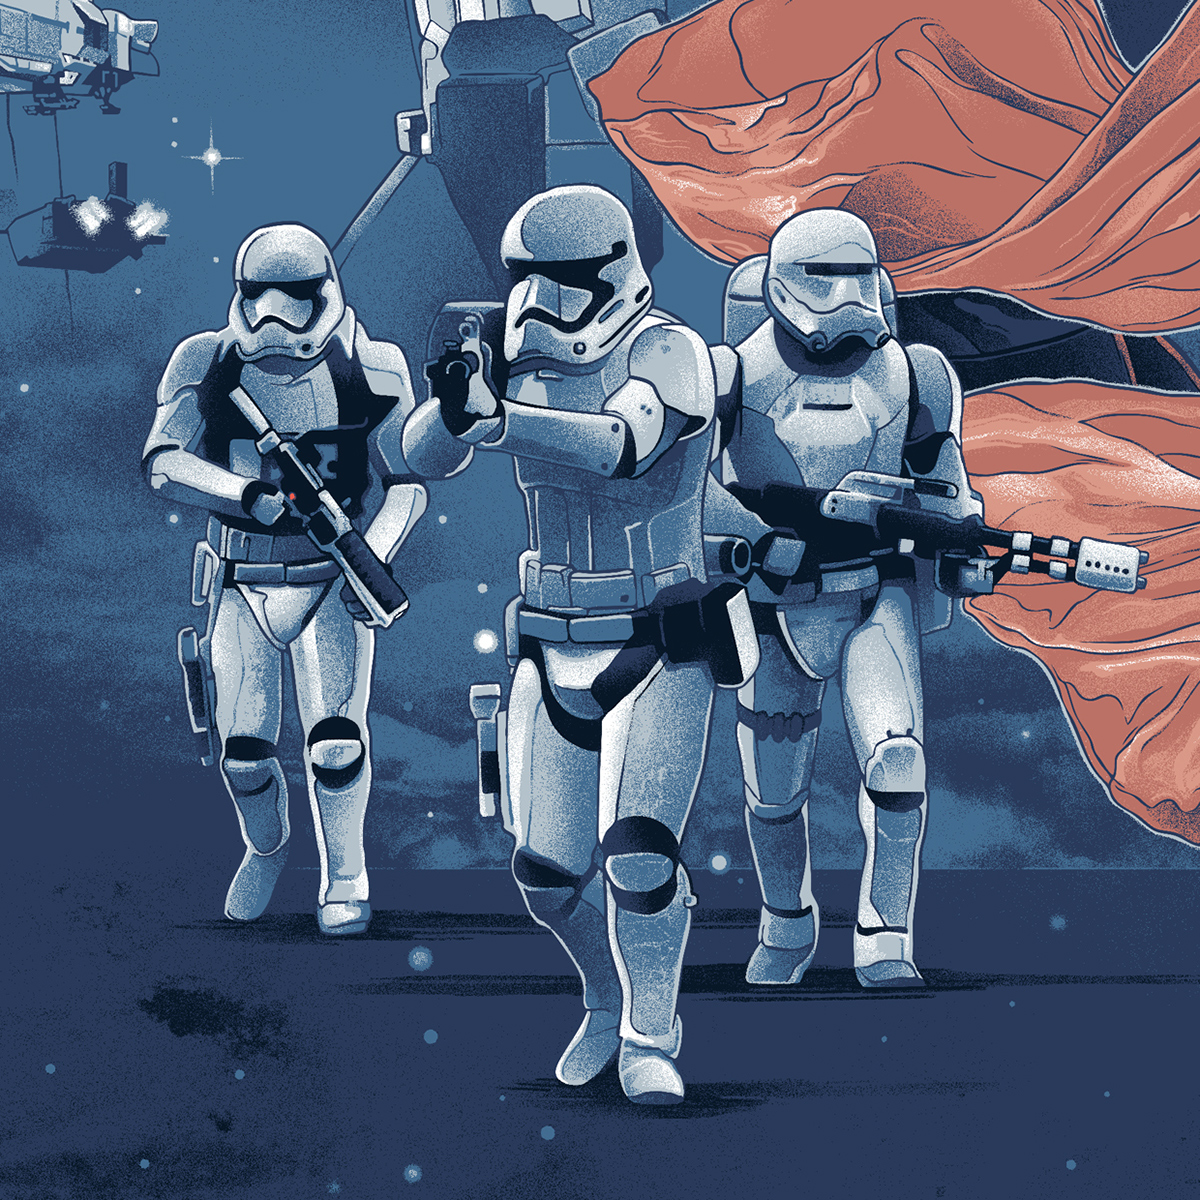 Gabz Grzegorz Domaradzki star wars bottleneck gallery The Force Awakens poster ILLUSTRATION  screen print